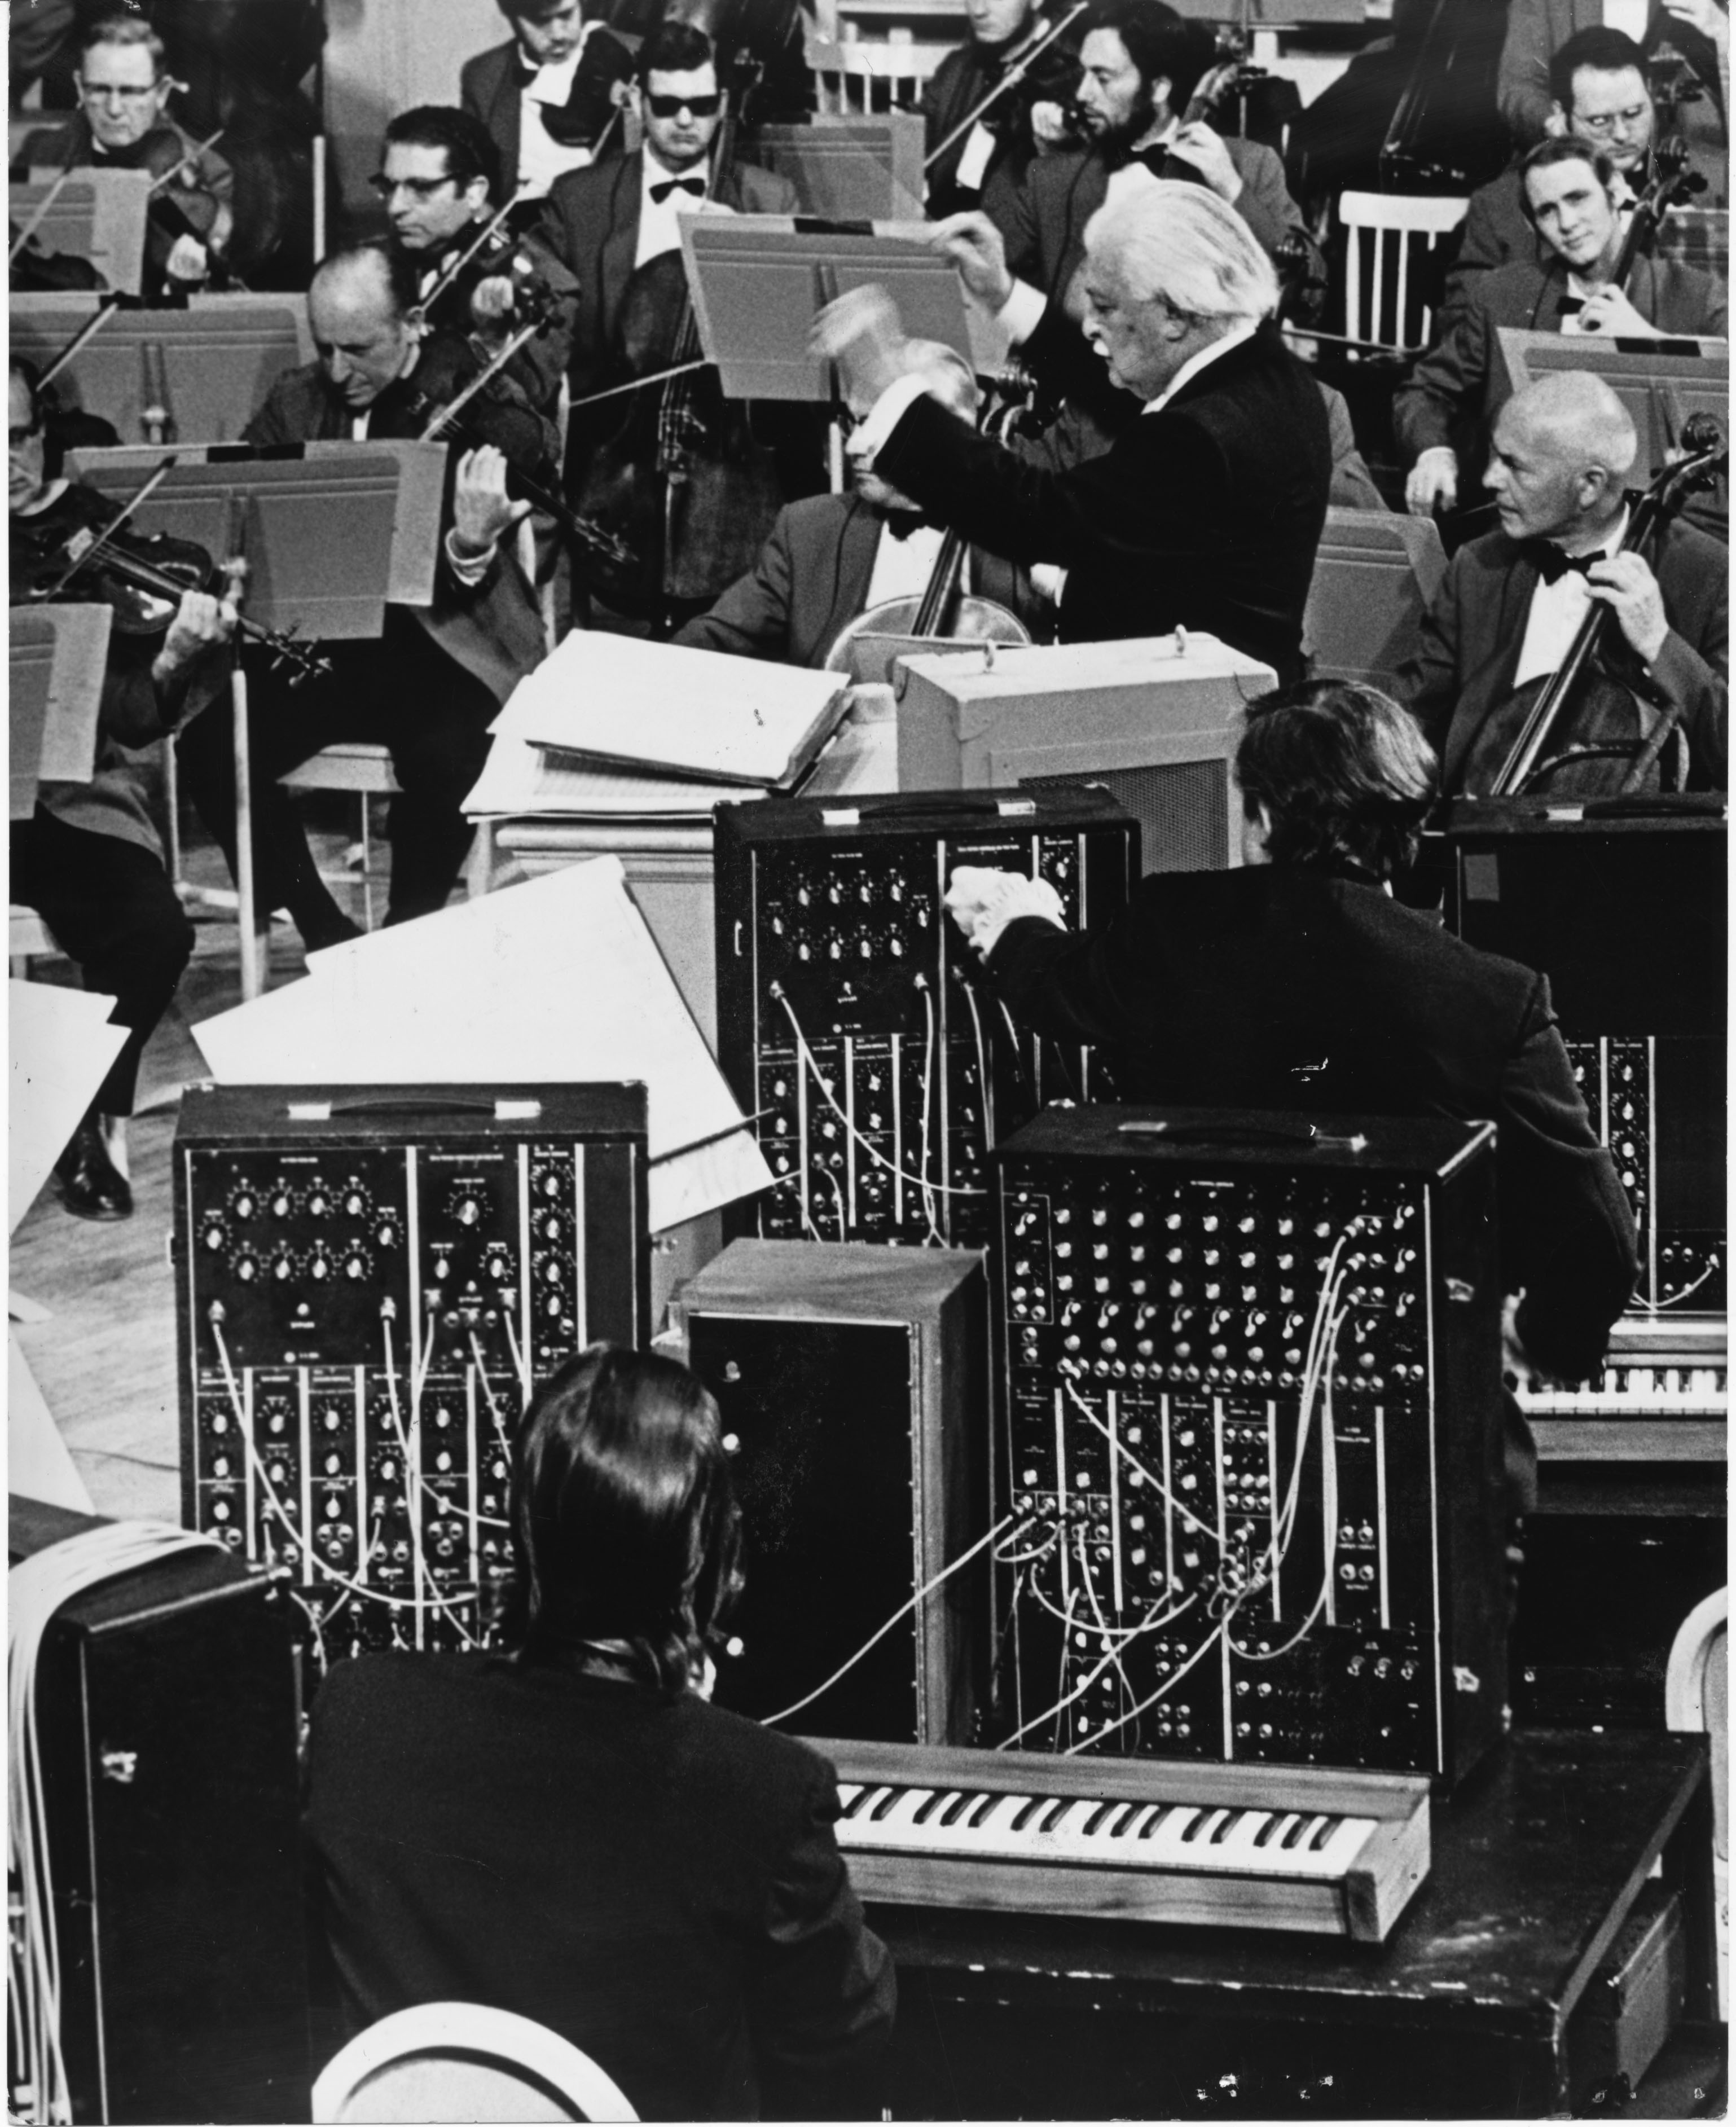 Photo courtesy of the Bob Moog Foundation Archives